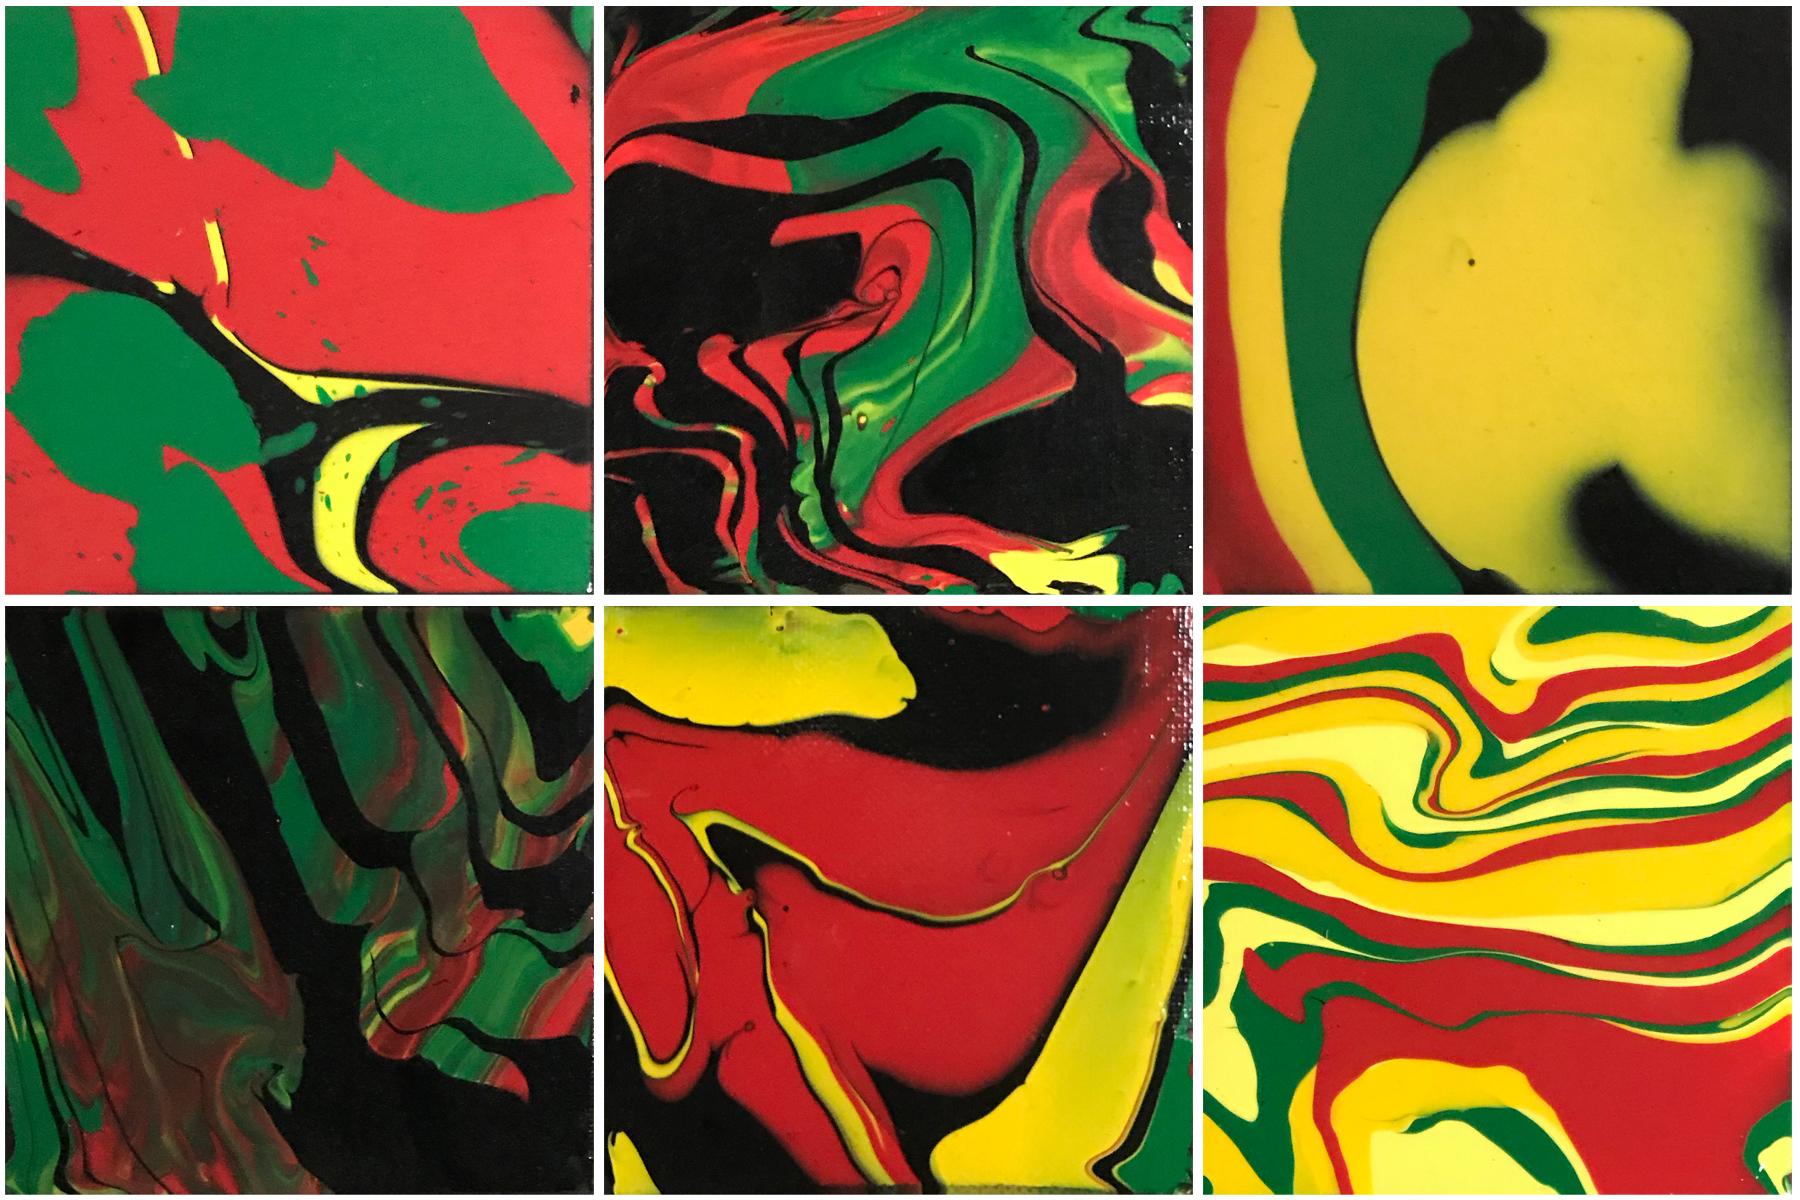 _YaniPaints - Jah Rastafari - acrylic on canvas - 6 4x4 panels - 2018 - $200.jpg